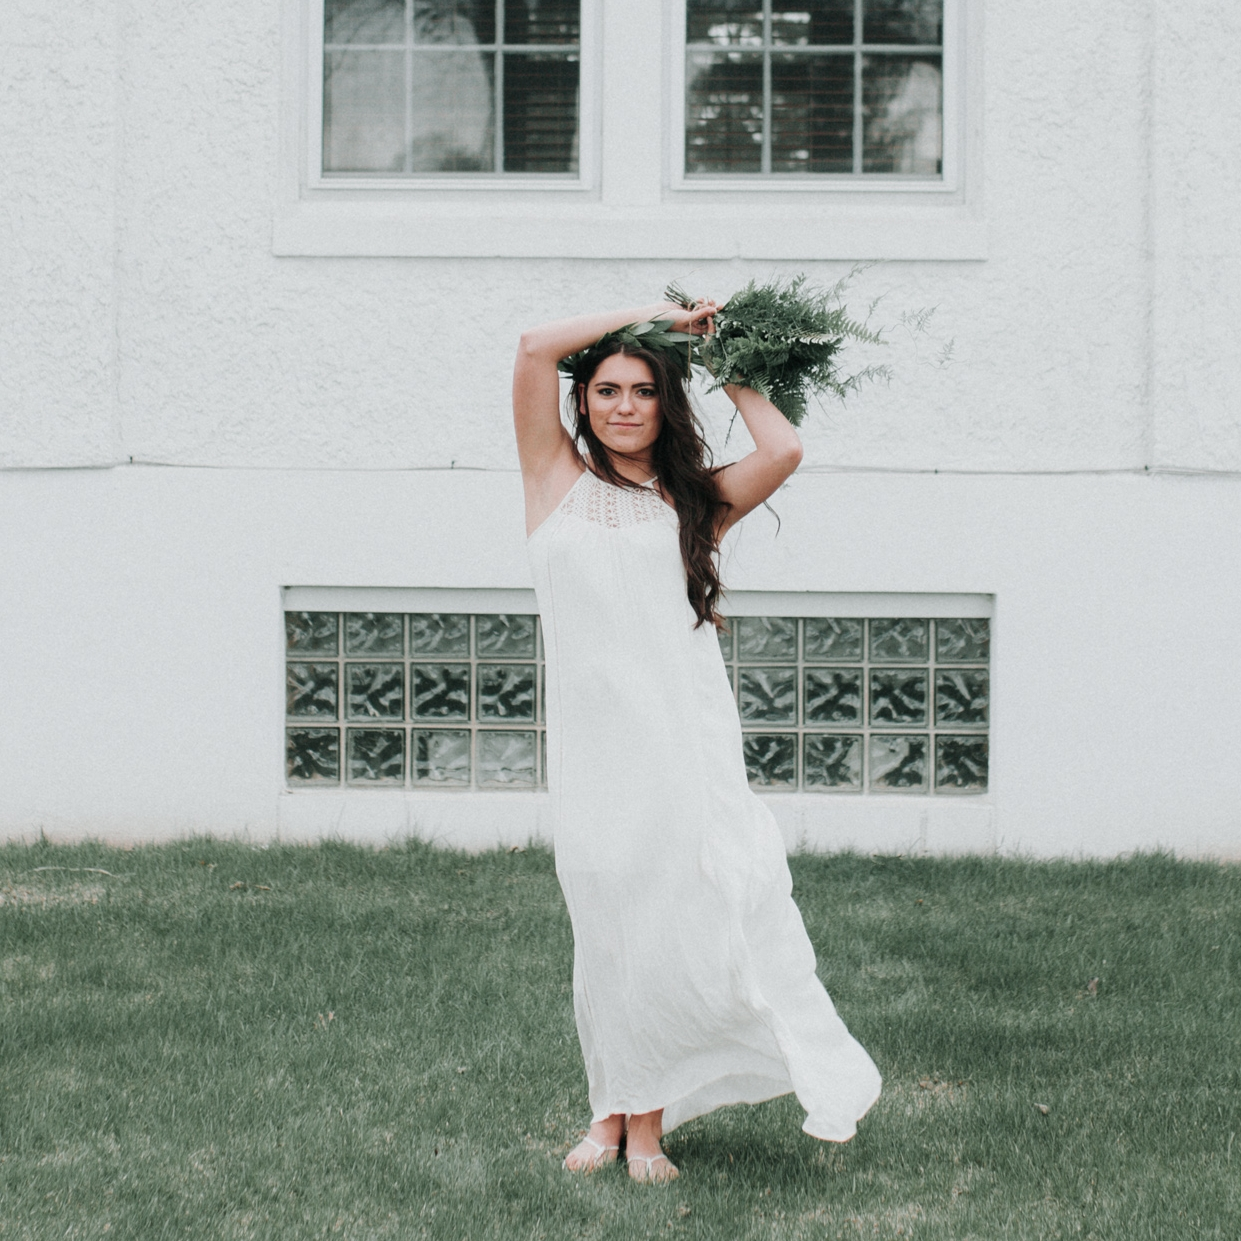 boho bridal | north shore photo co.